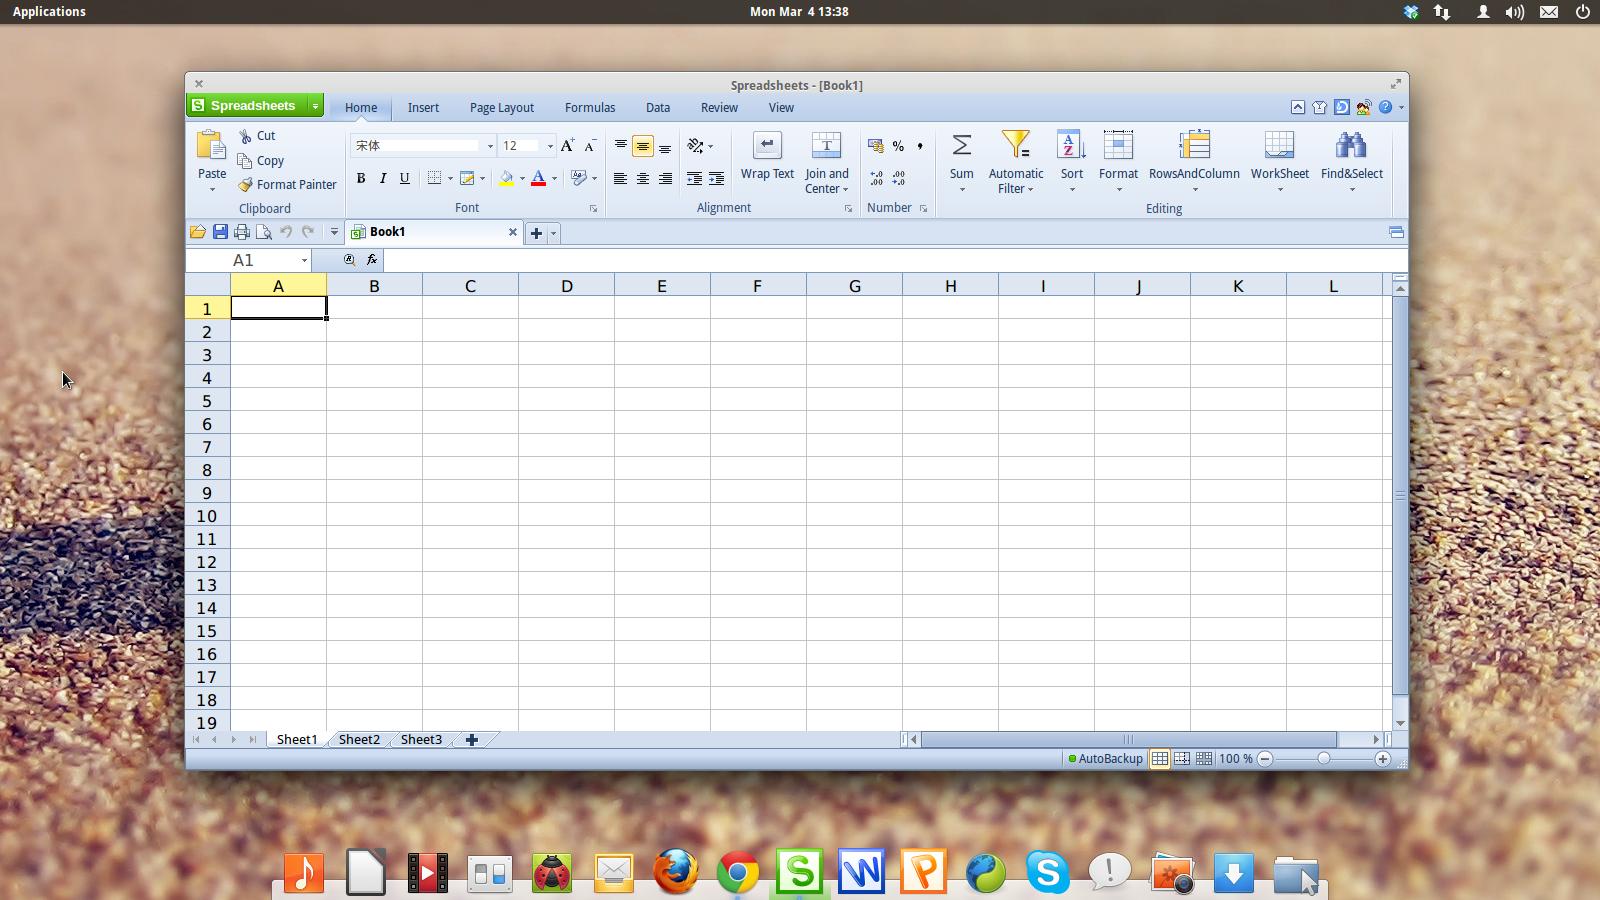 Jfn linux project wps office kingsoft office a - Kingsoft office free download for windows 7 ...